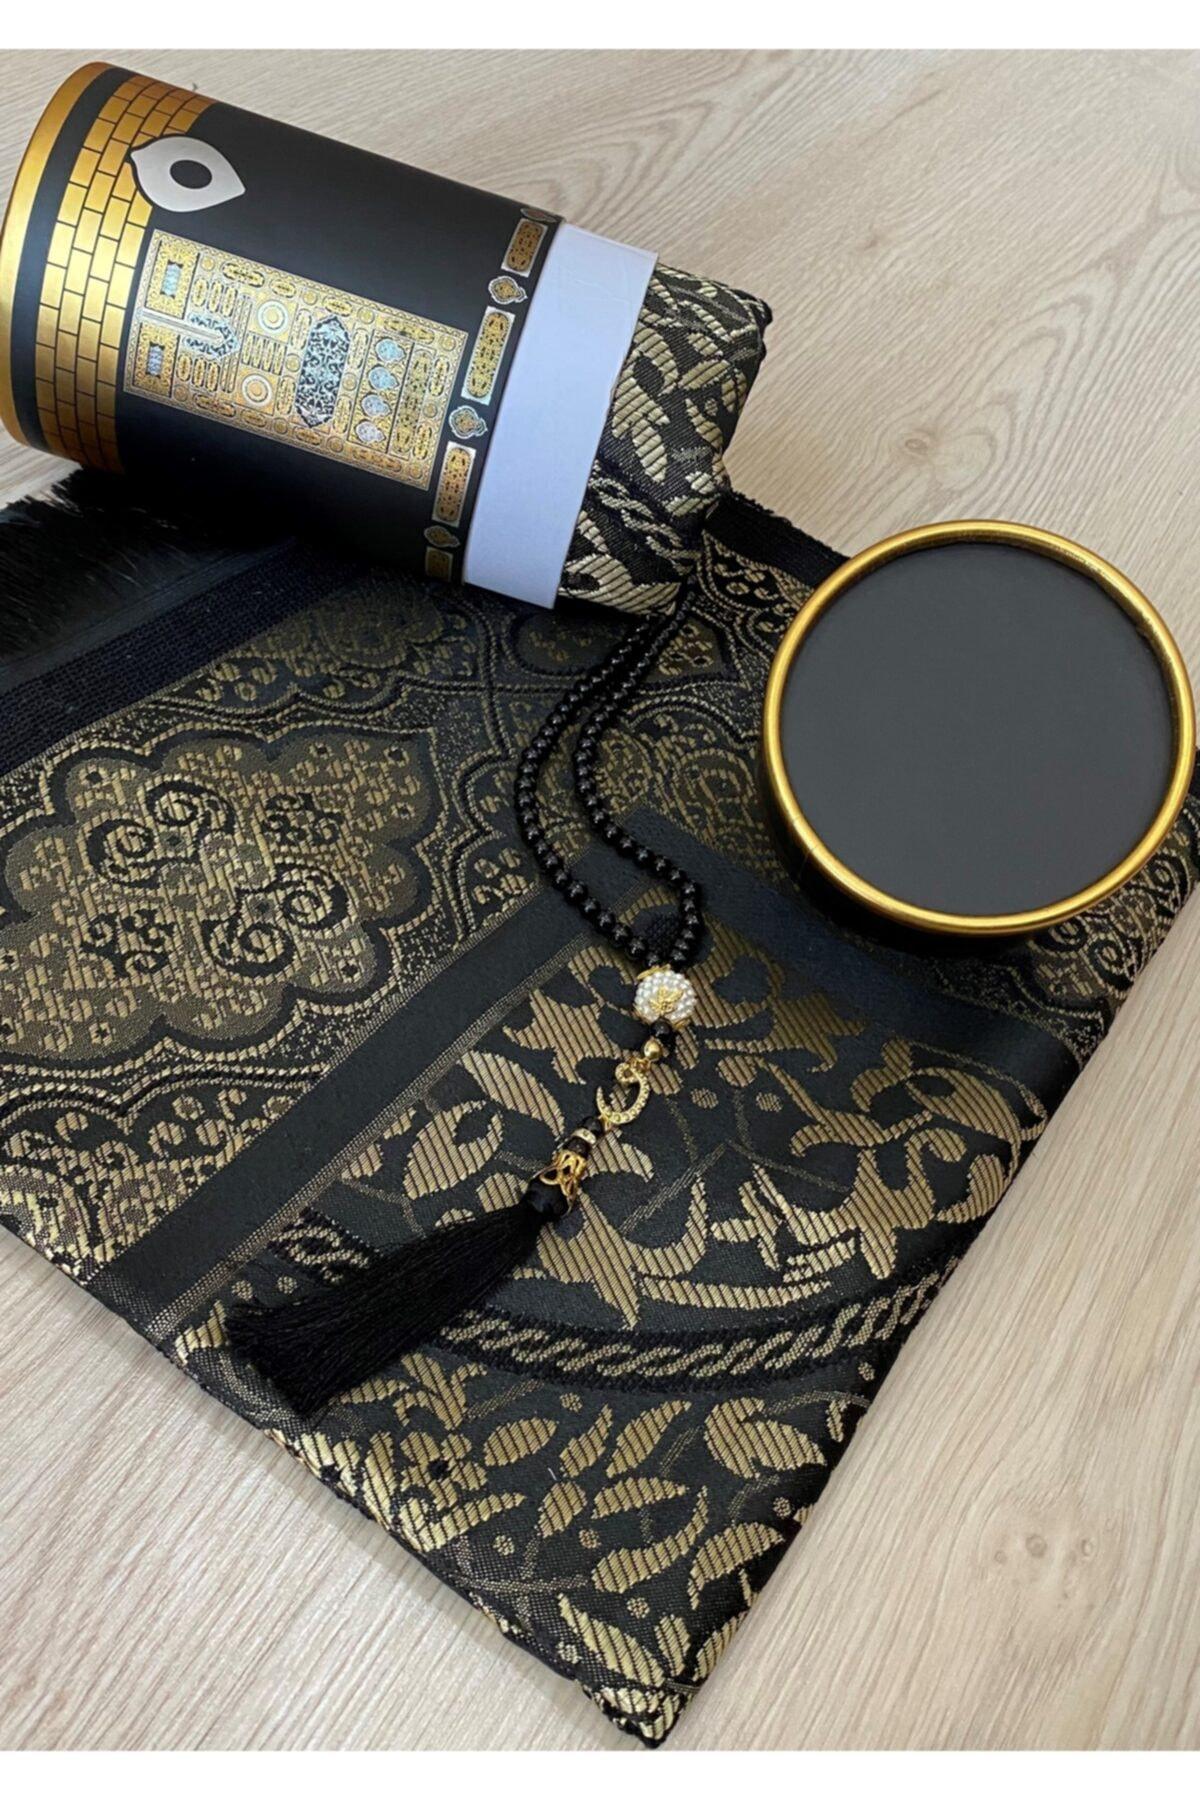 2021 model hajj gift prayer rug Gift Dowries Boxed Kaba Pattern Prayer Rosary Set prayer rug 12 pcs